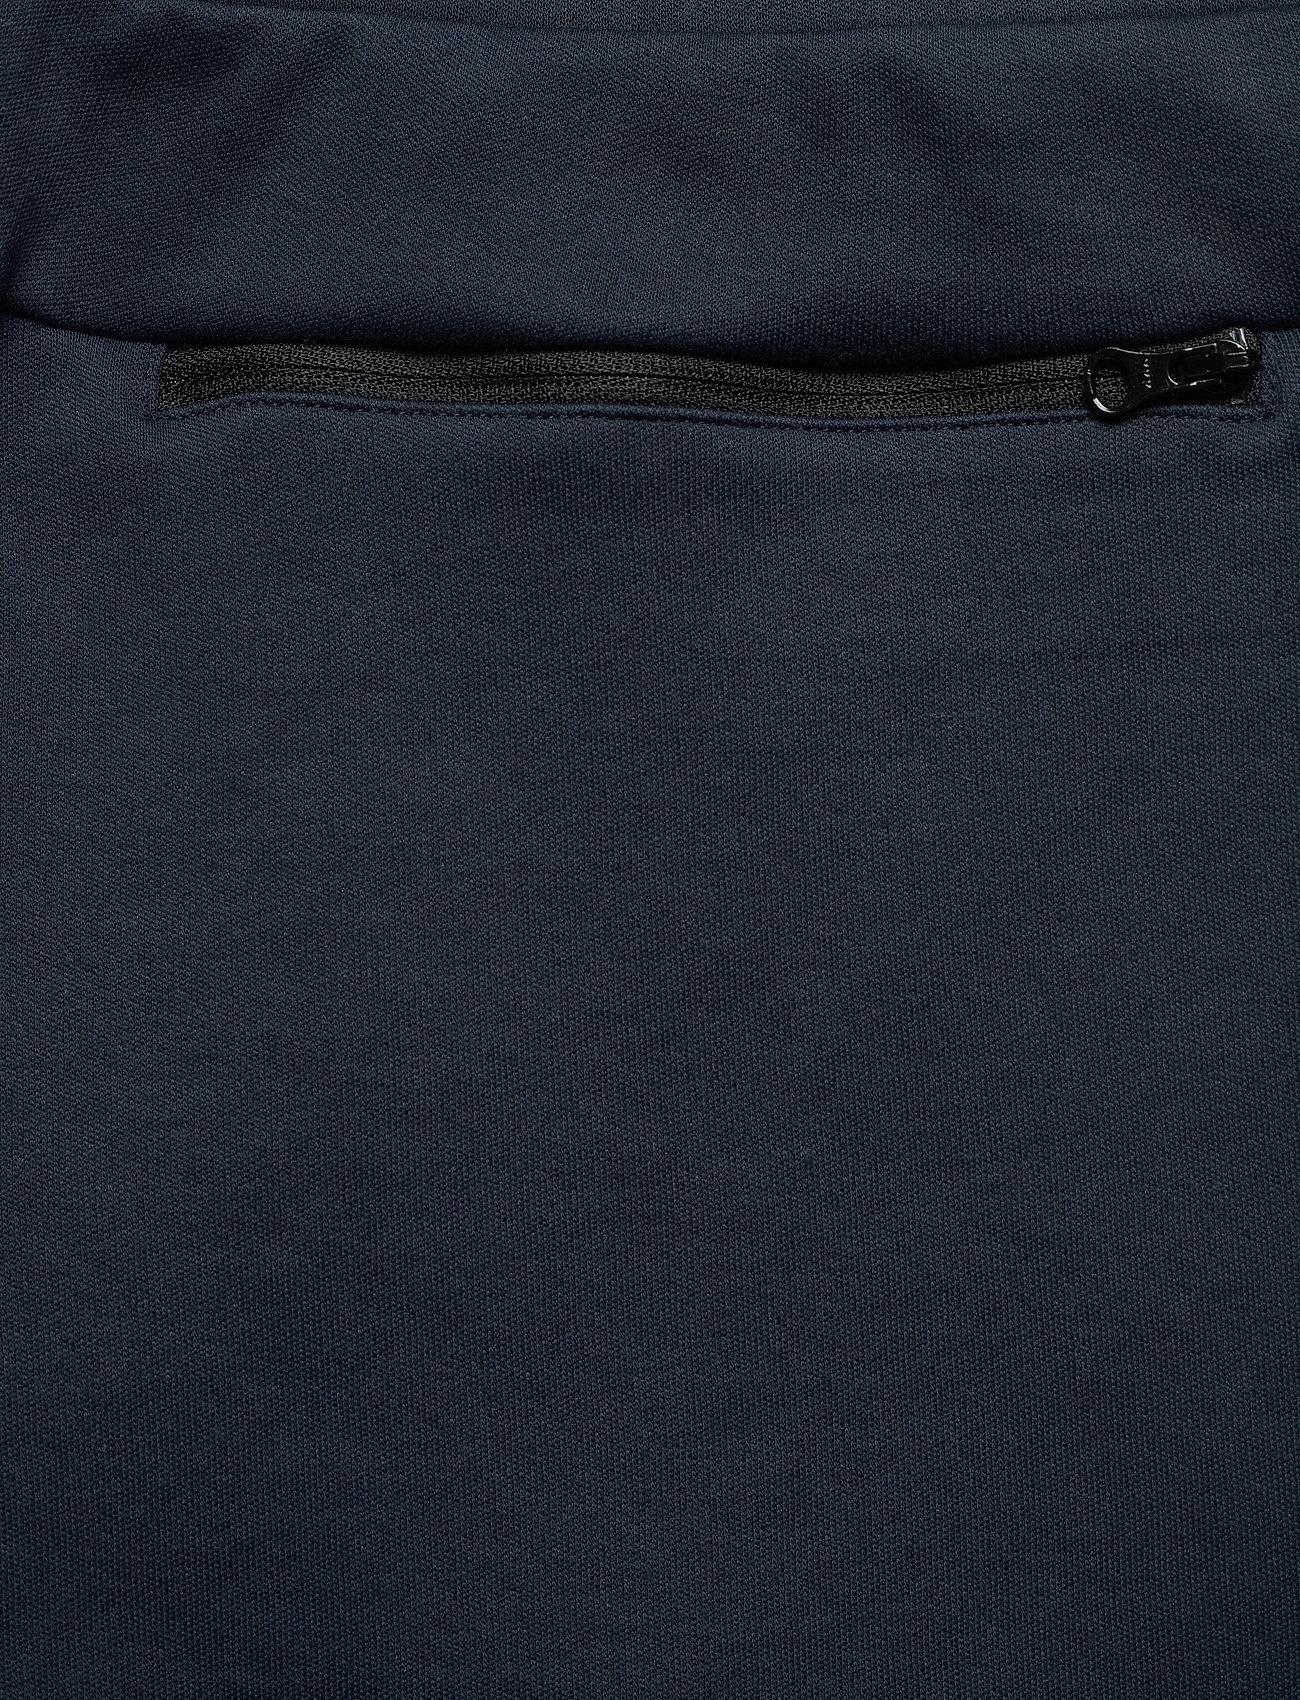 Peak Performance M Tech Shorts - Shorts BLUE SHADOW - Menn Klær